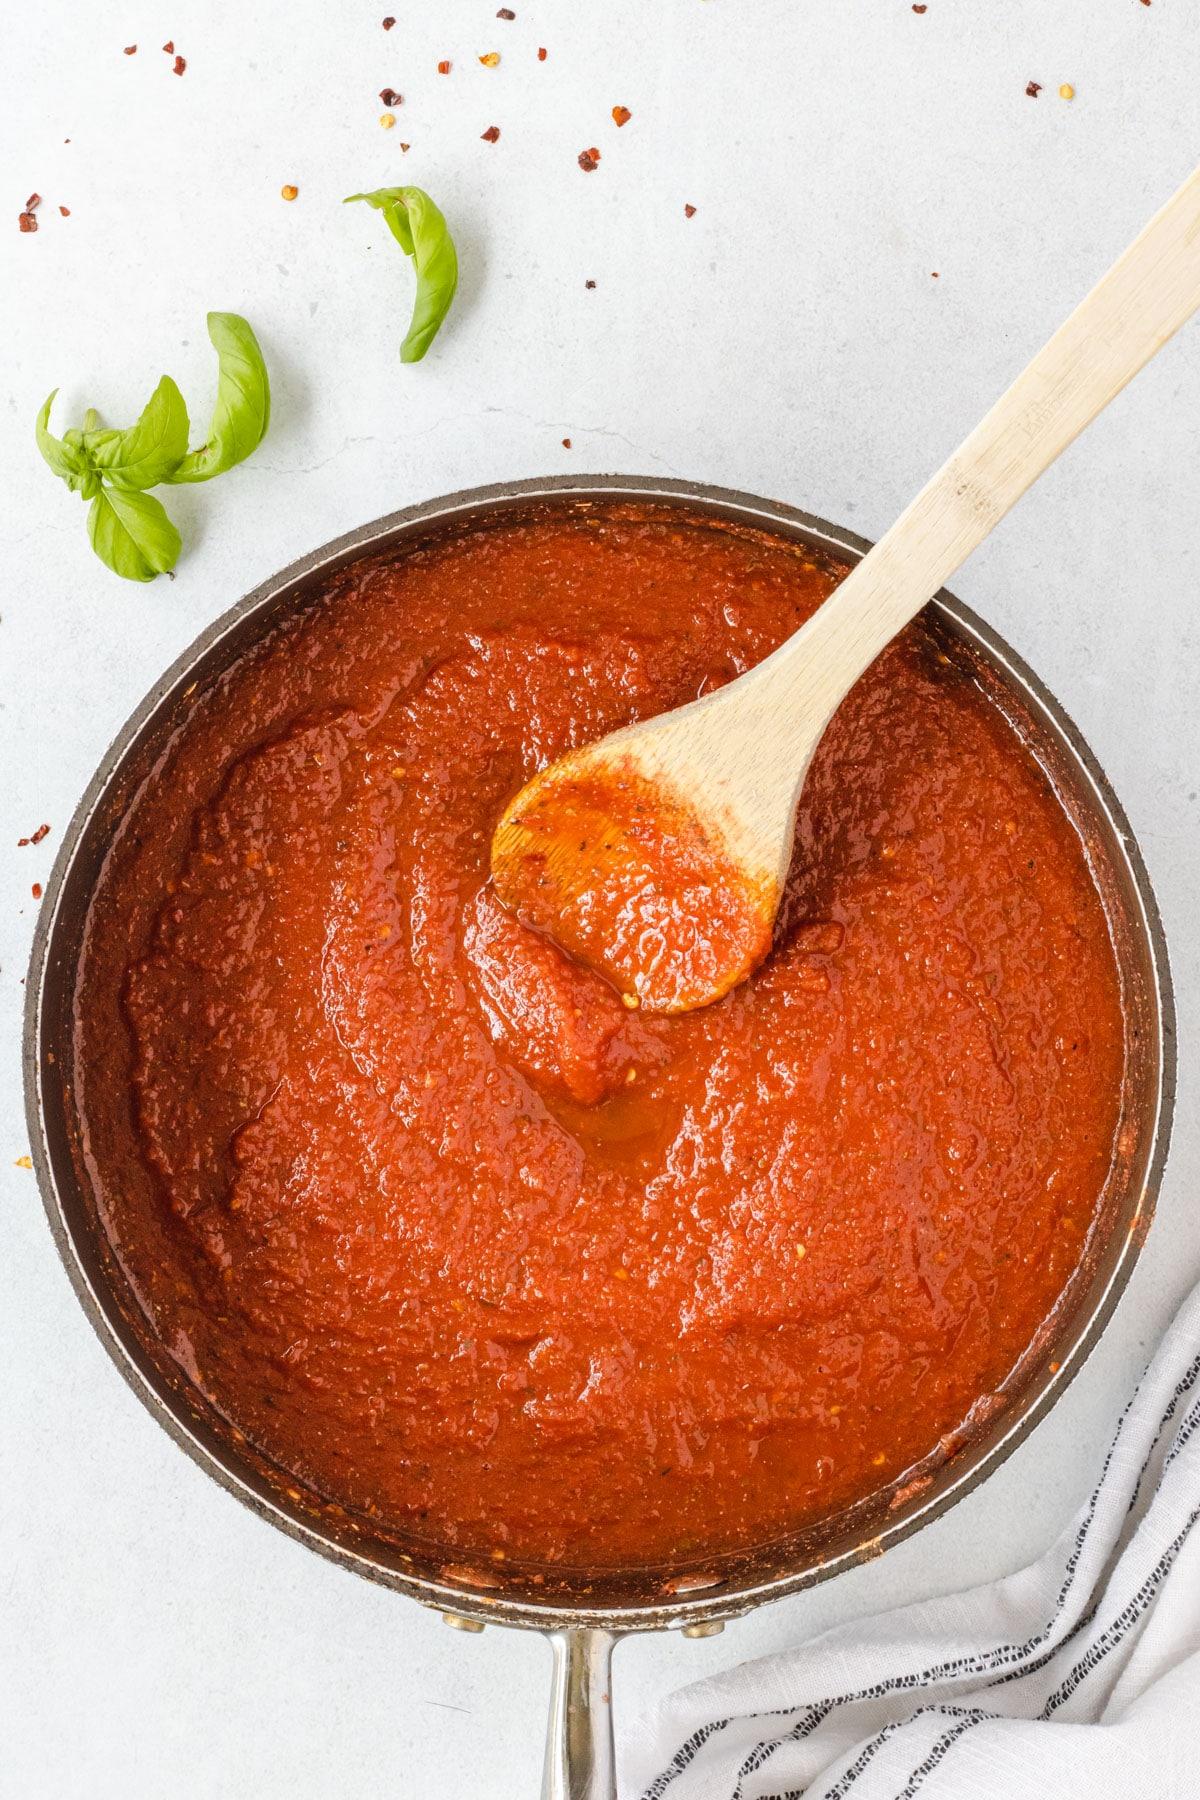 Wooden spoon stirring sauce.